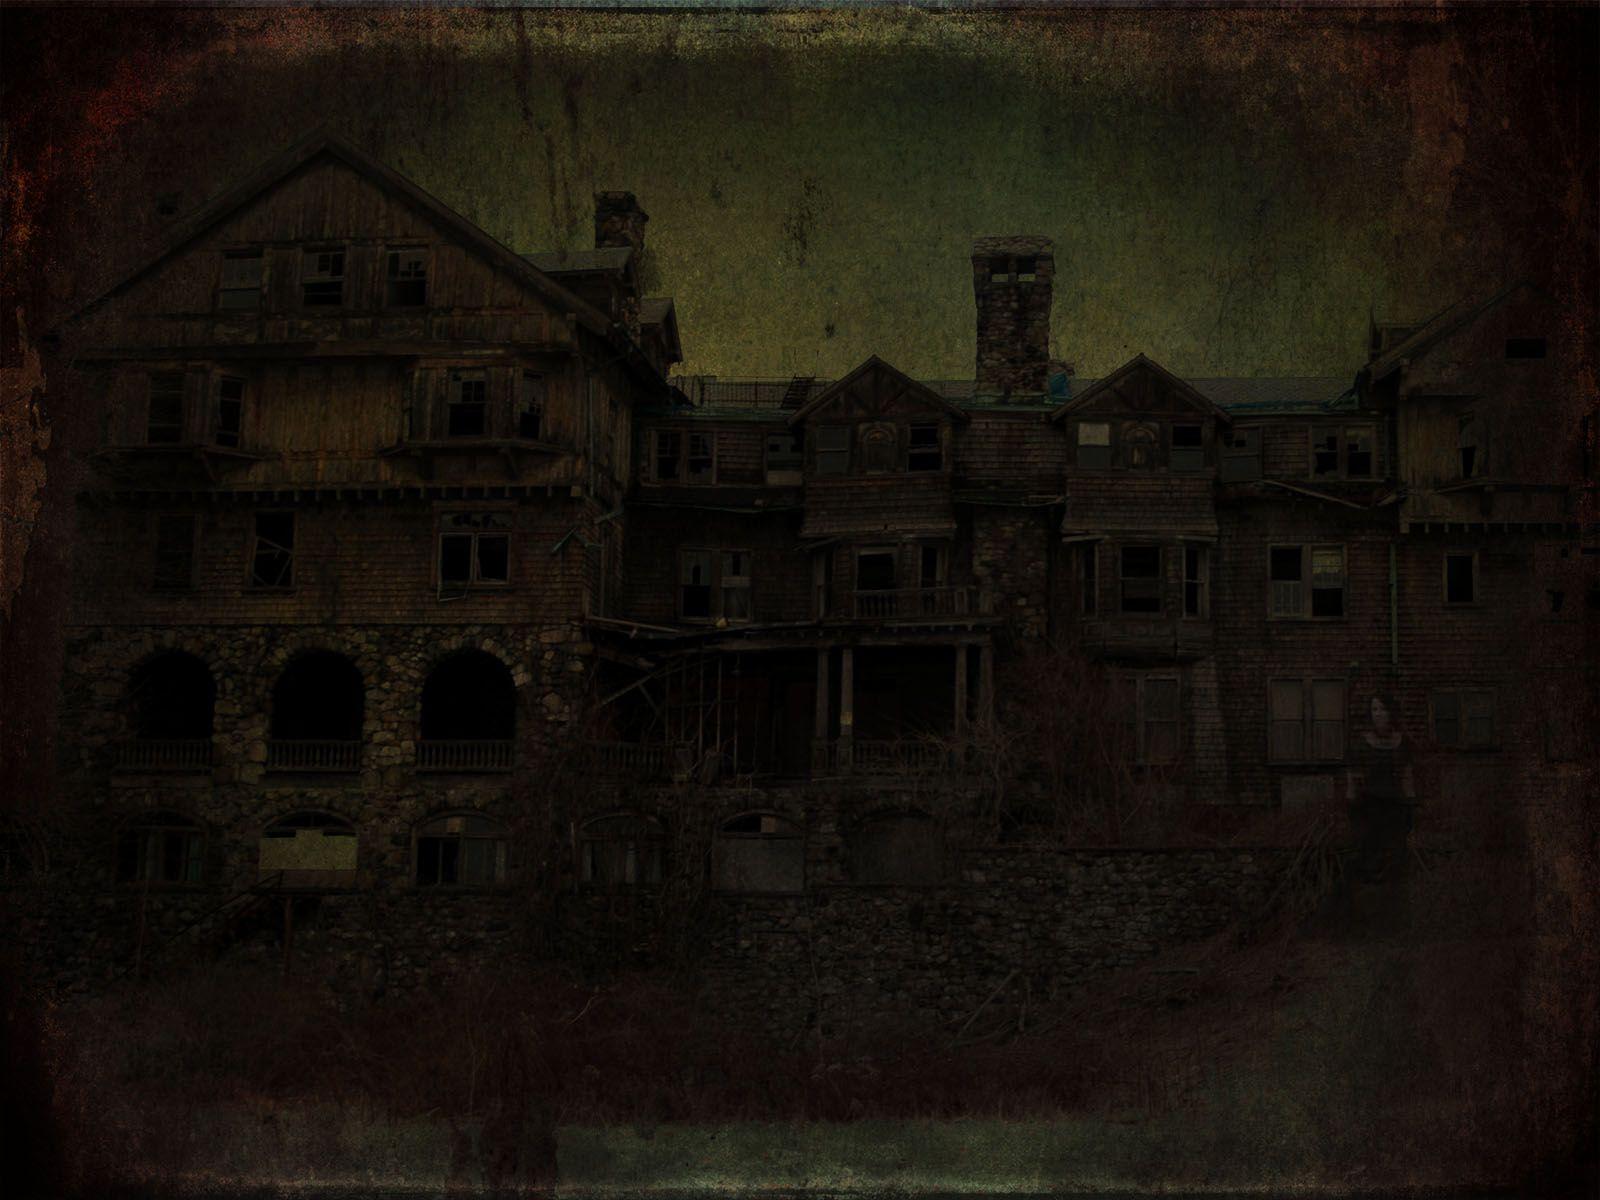 Best Wallpaper Halloween Haunted - a00ac52b0c051fb3c893c5c79fdeb394  Photograph_573121.jpg